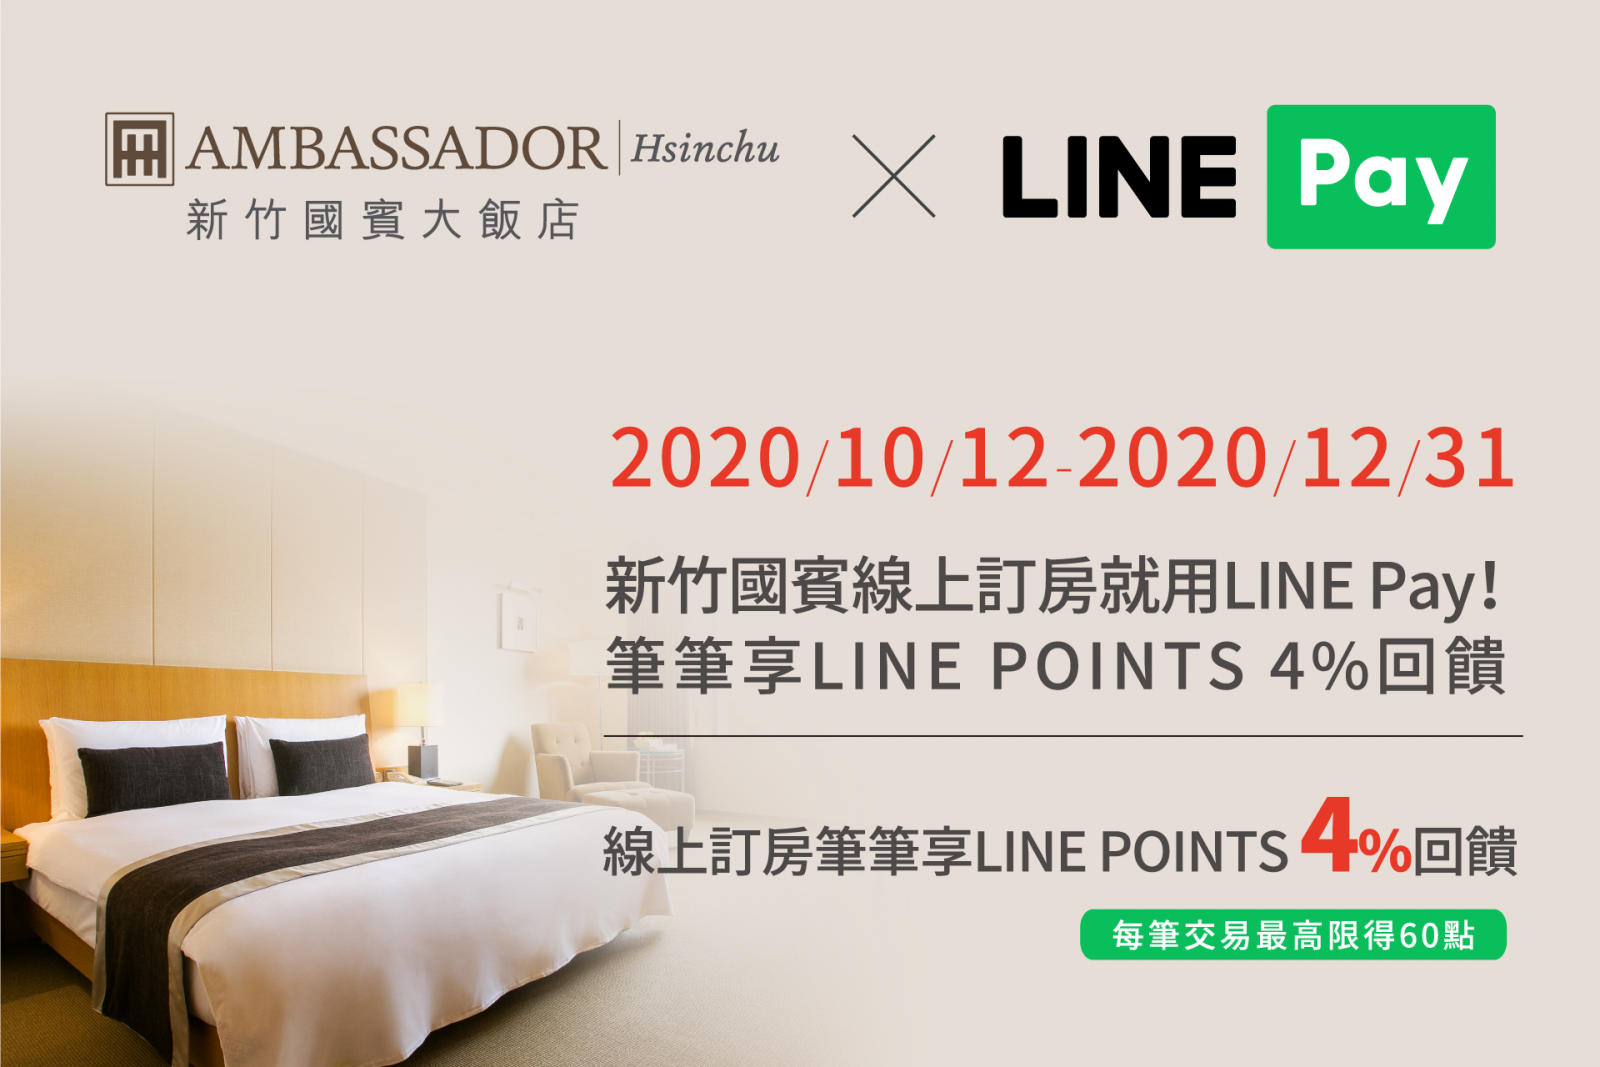 線上訂房刷LINE Pay 享LINE POINTS 4%回饋